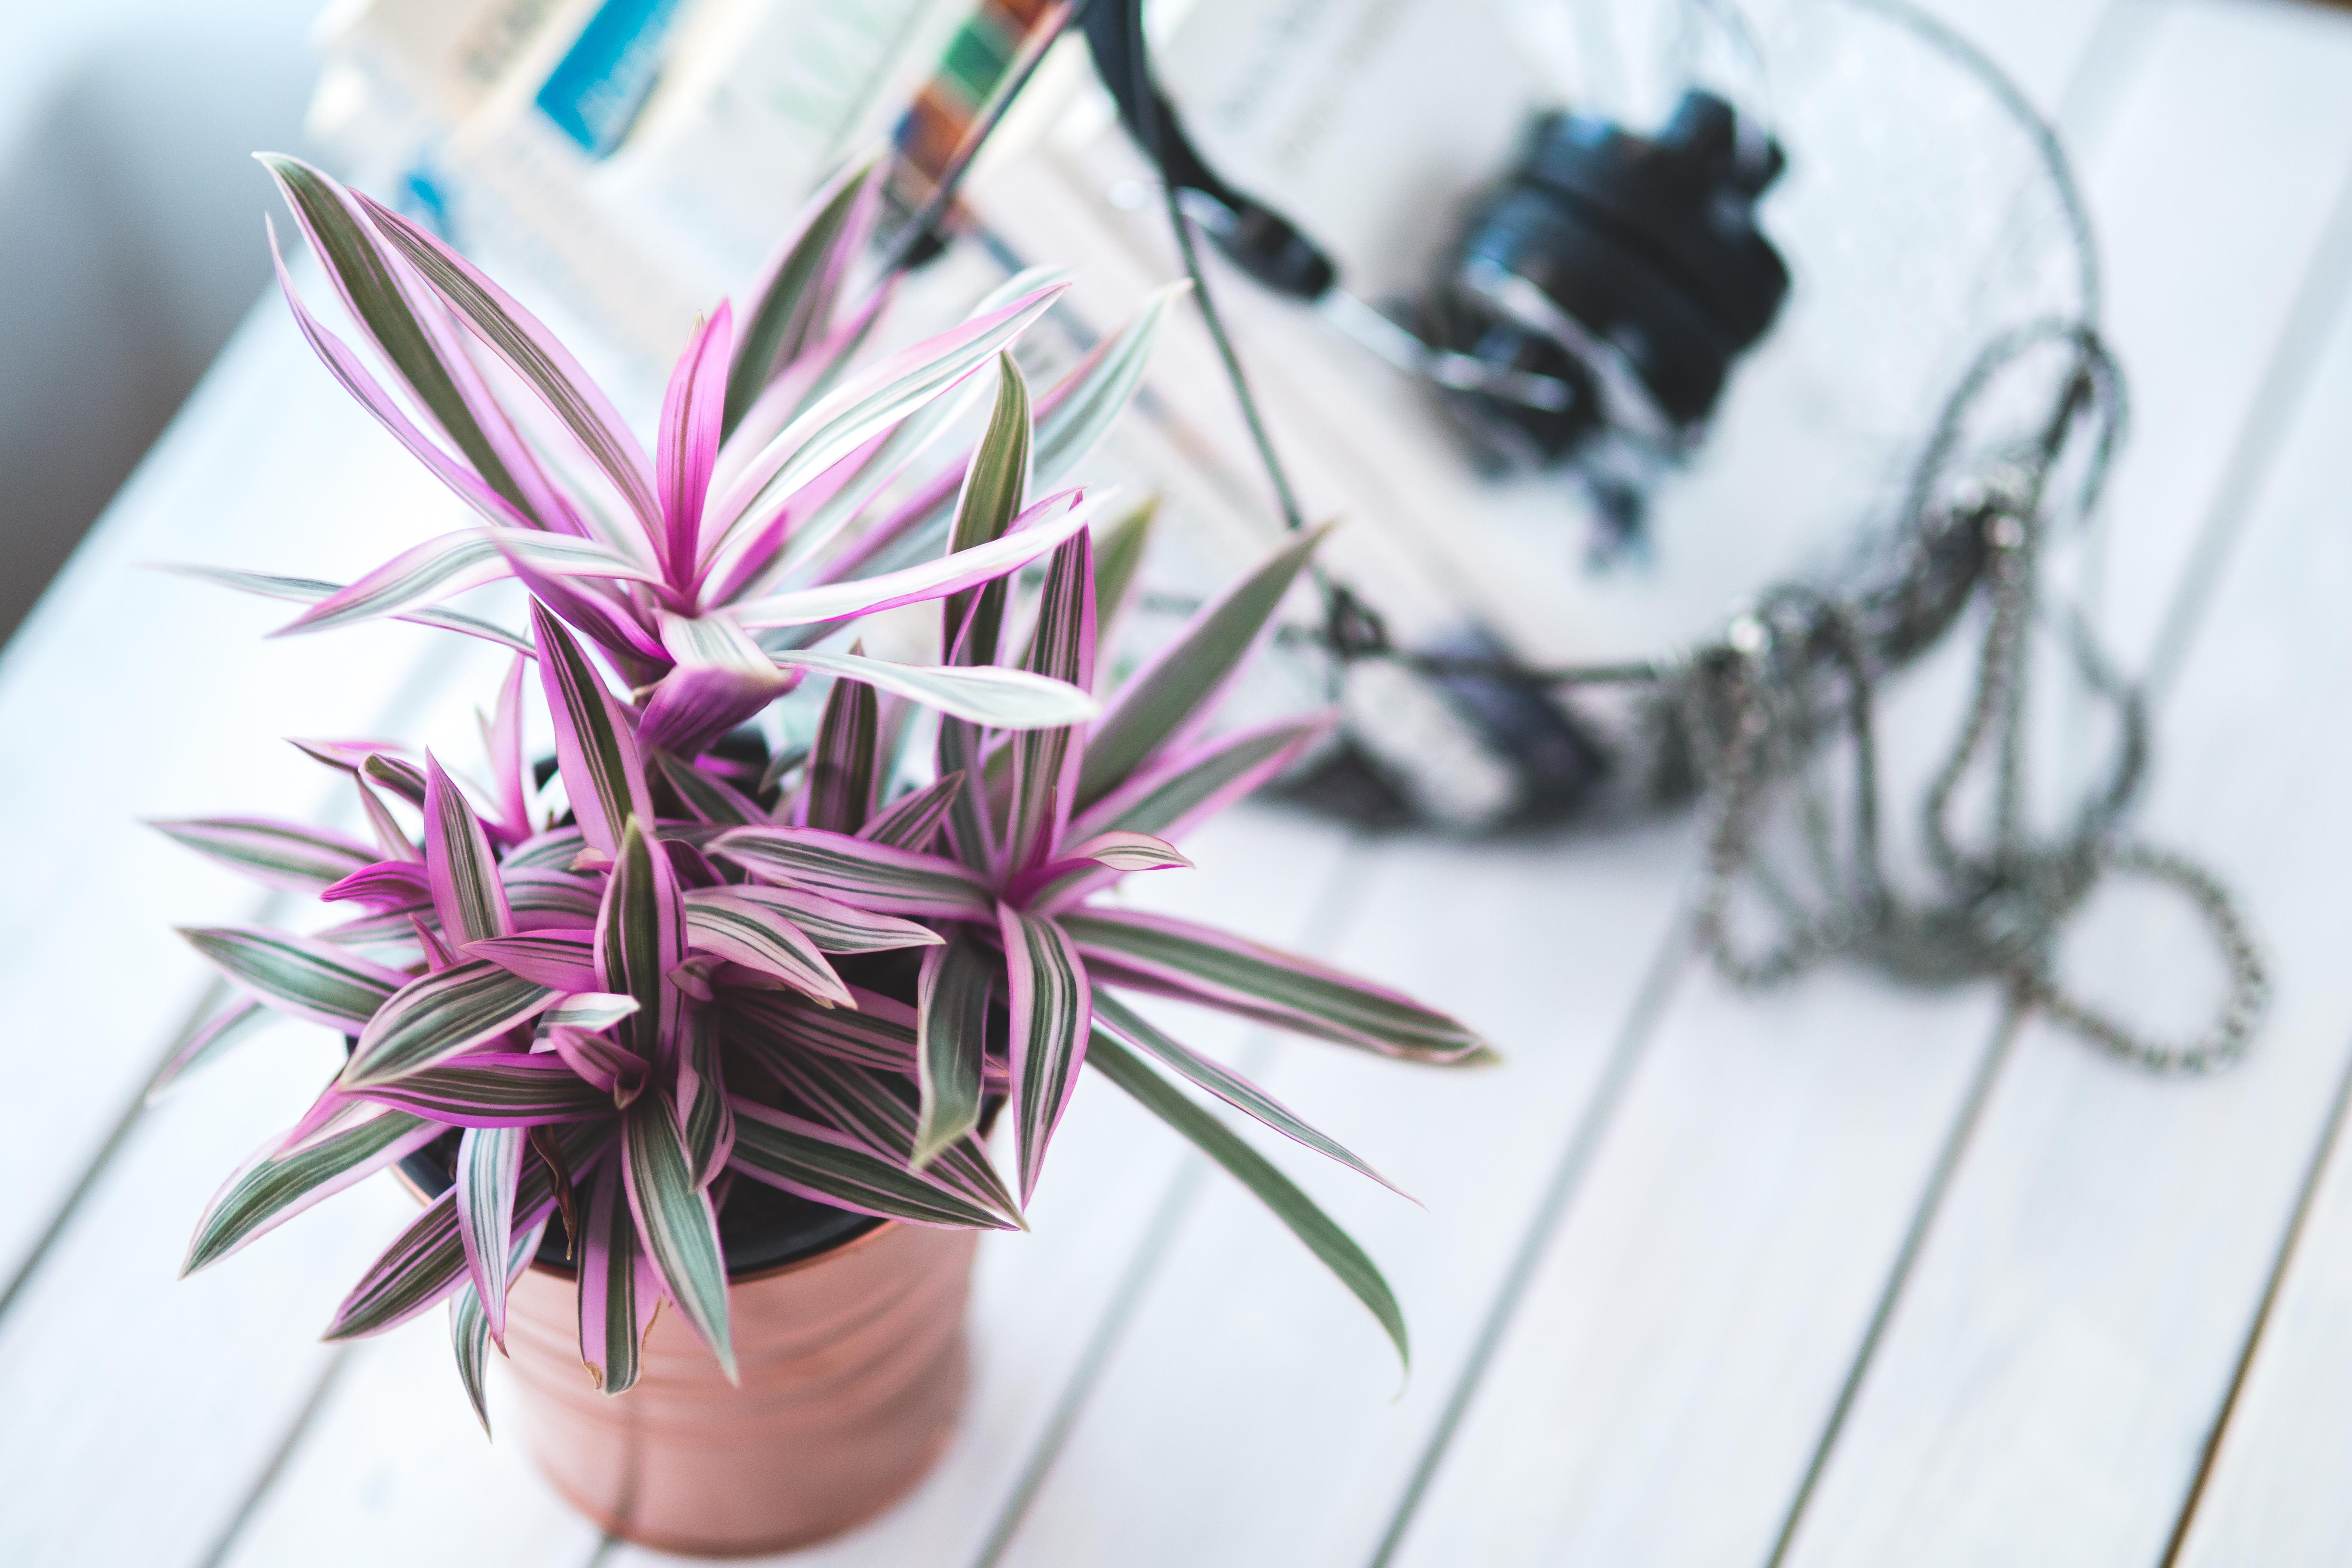 3 Creative Home Hobbies To Turn Into Careers